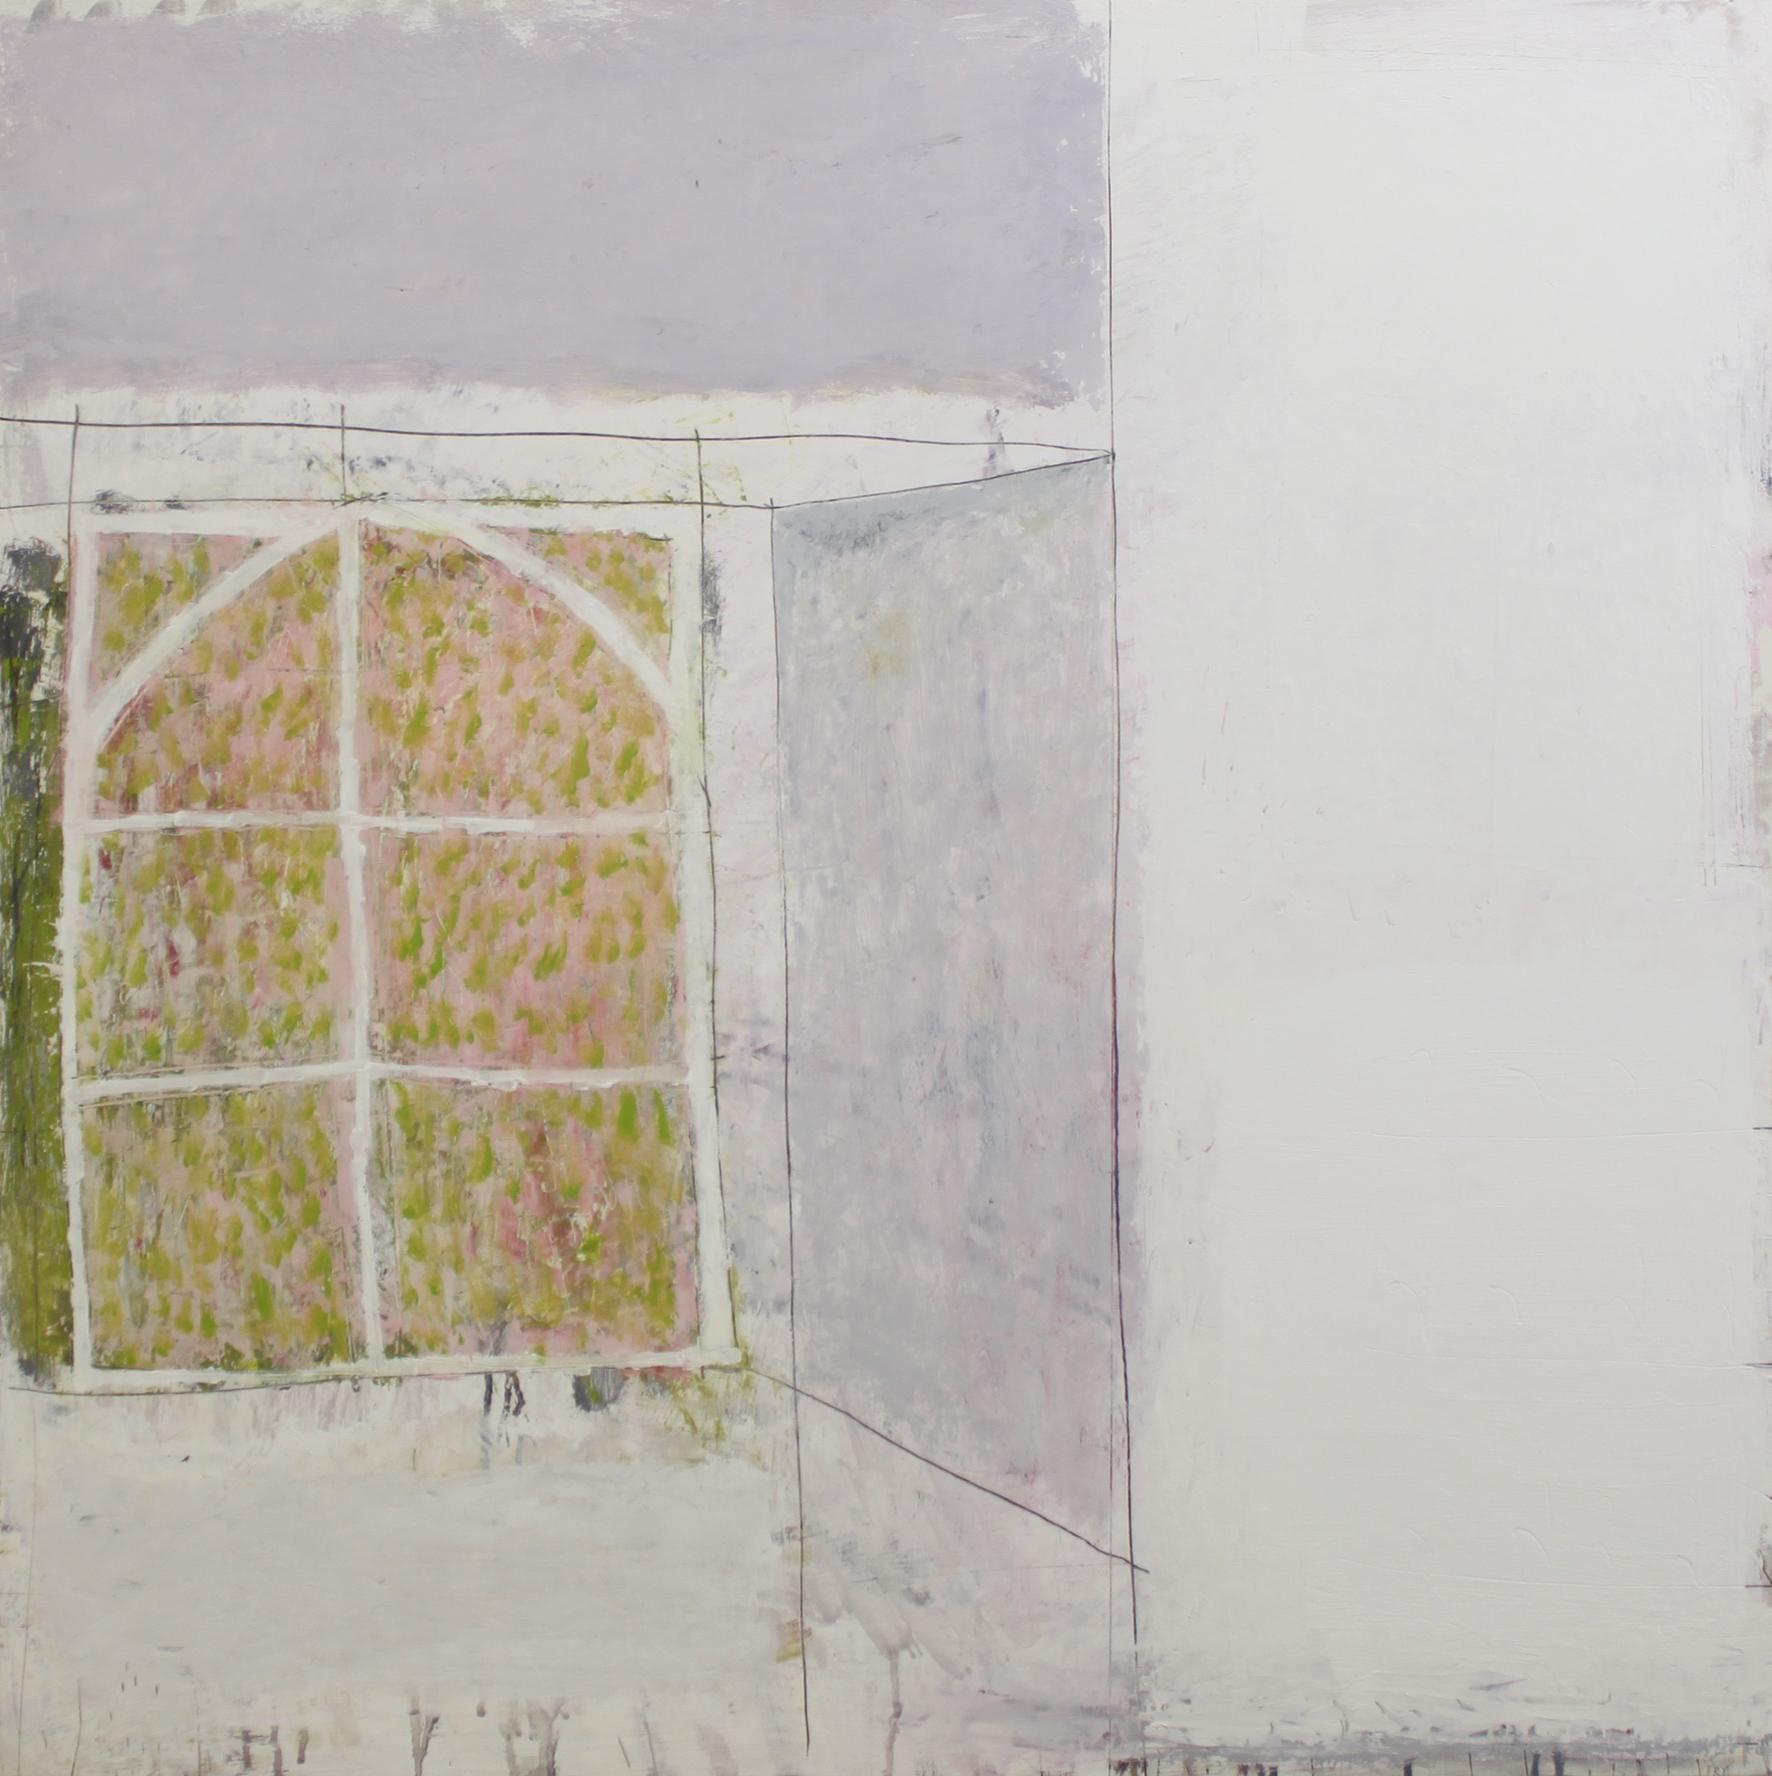 Paul Fry Studio window summer light 90 x 90 cm oil & graphite on canvas £3000